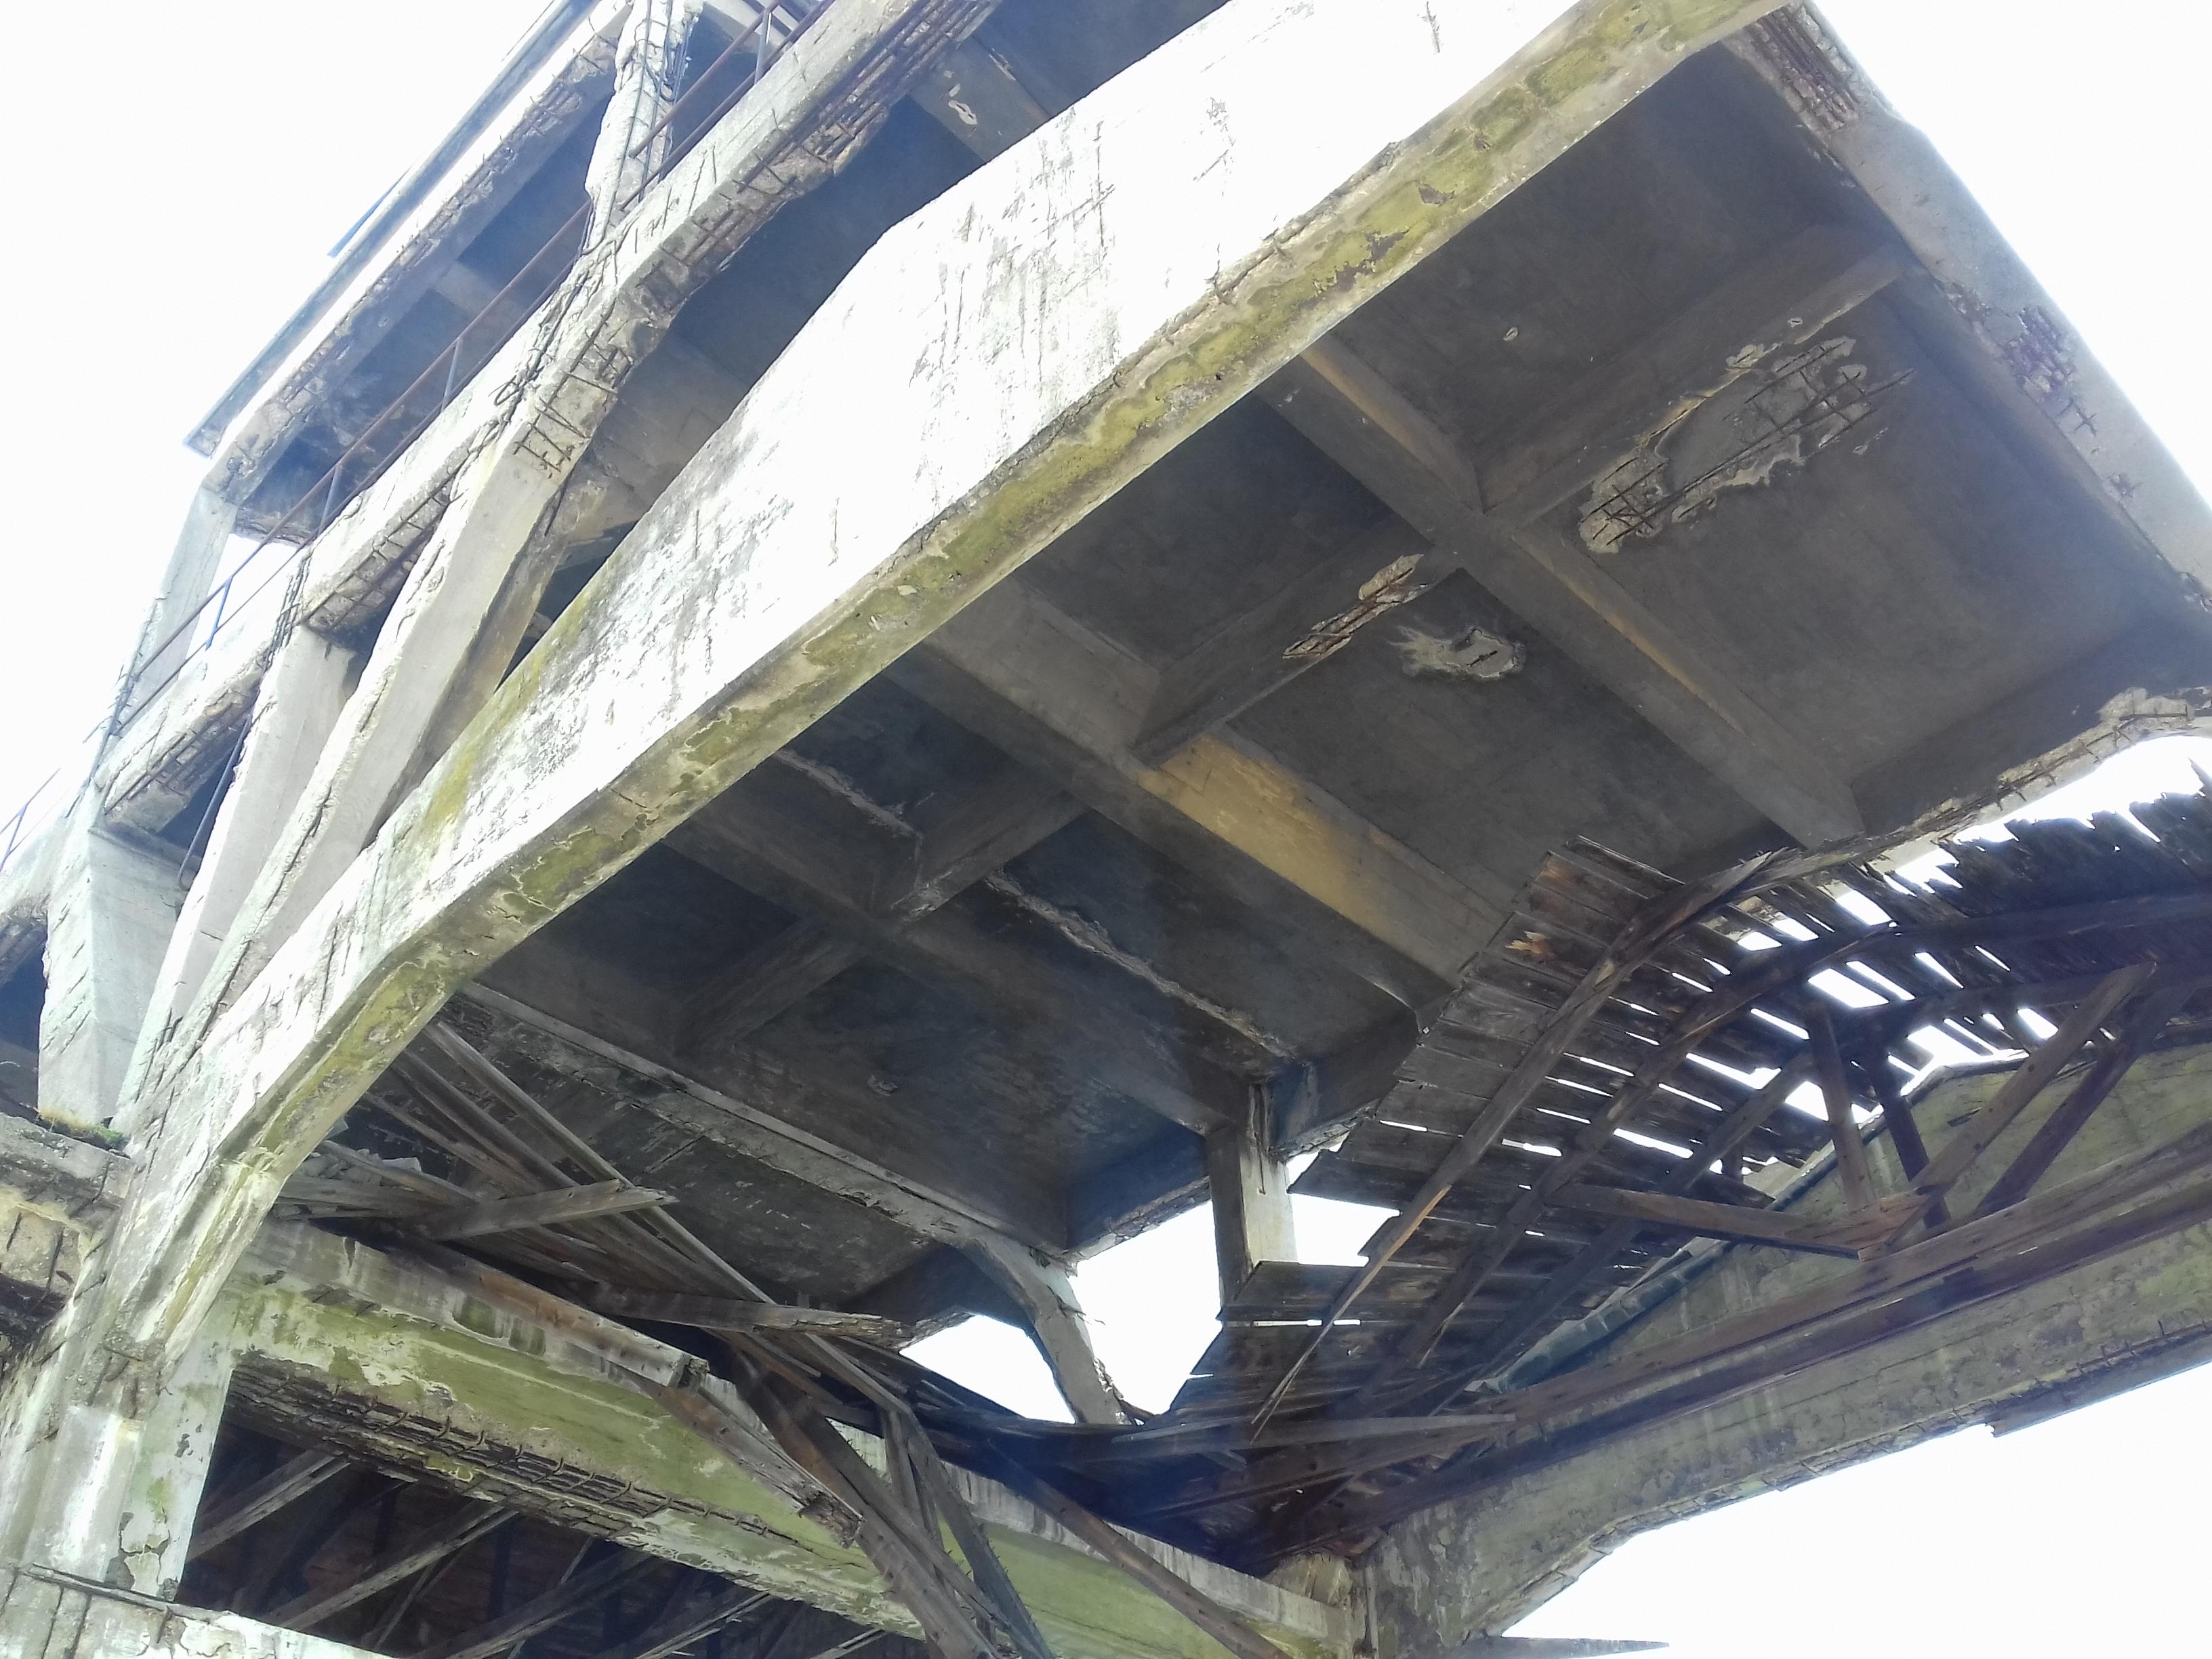 Urušio se krov lansirne rampe za torpeda na Mlaki / Snimio Marko GRACIN